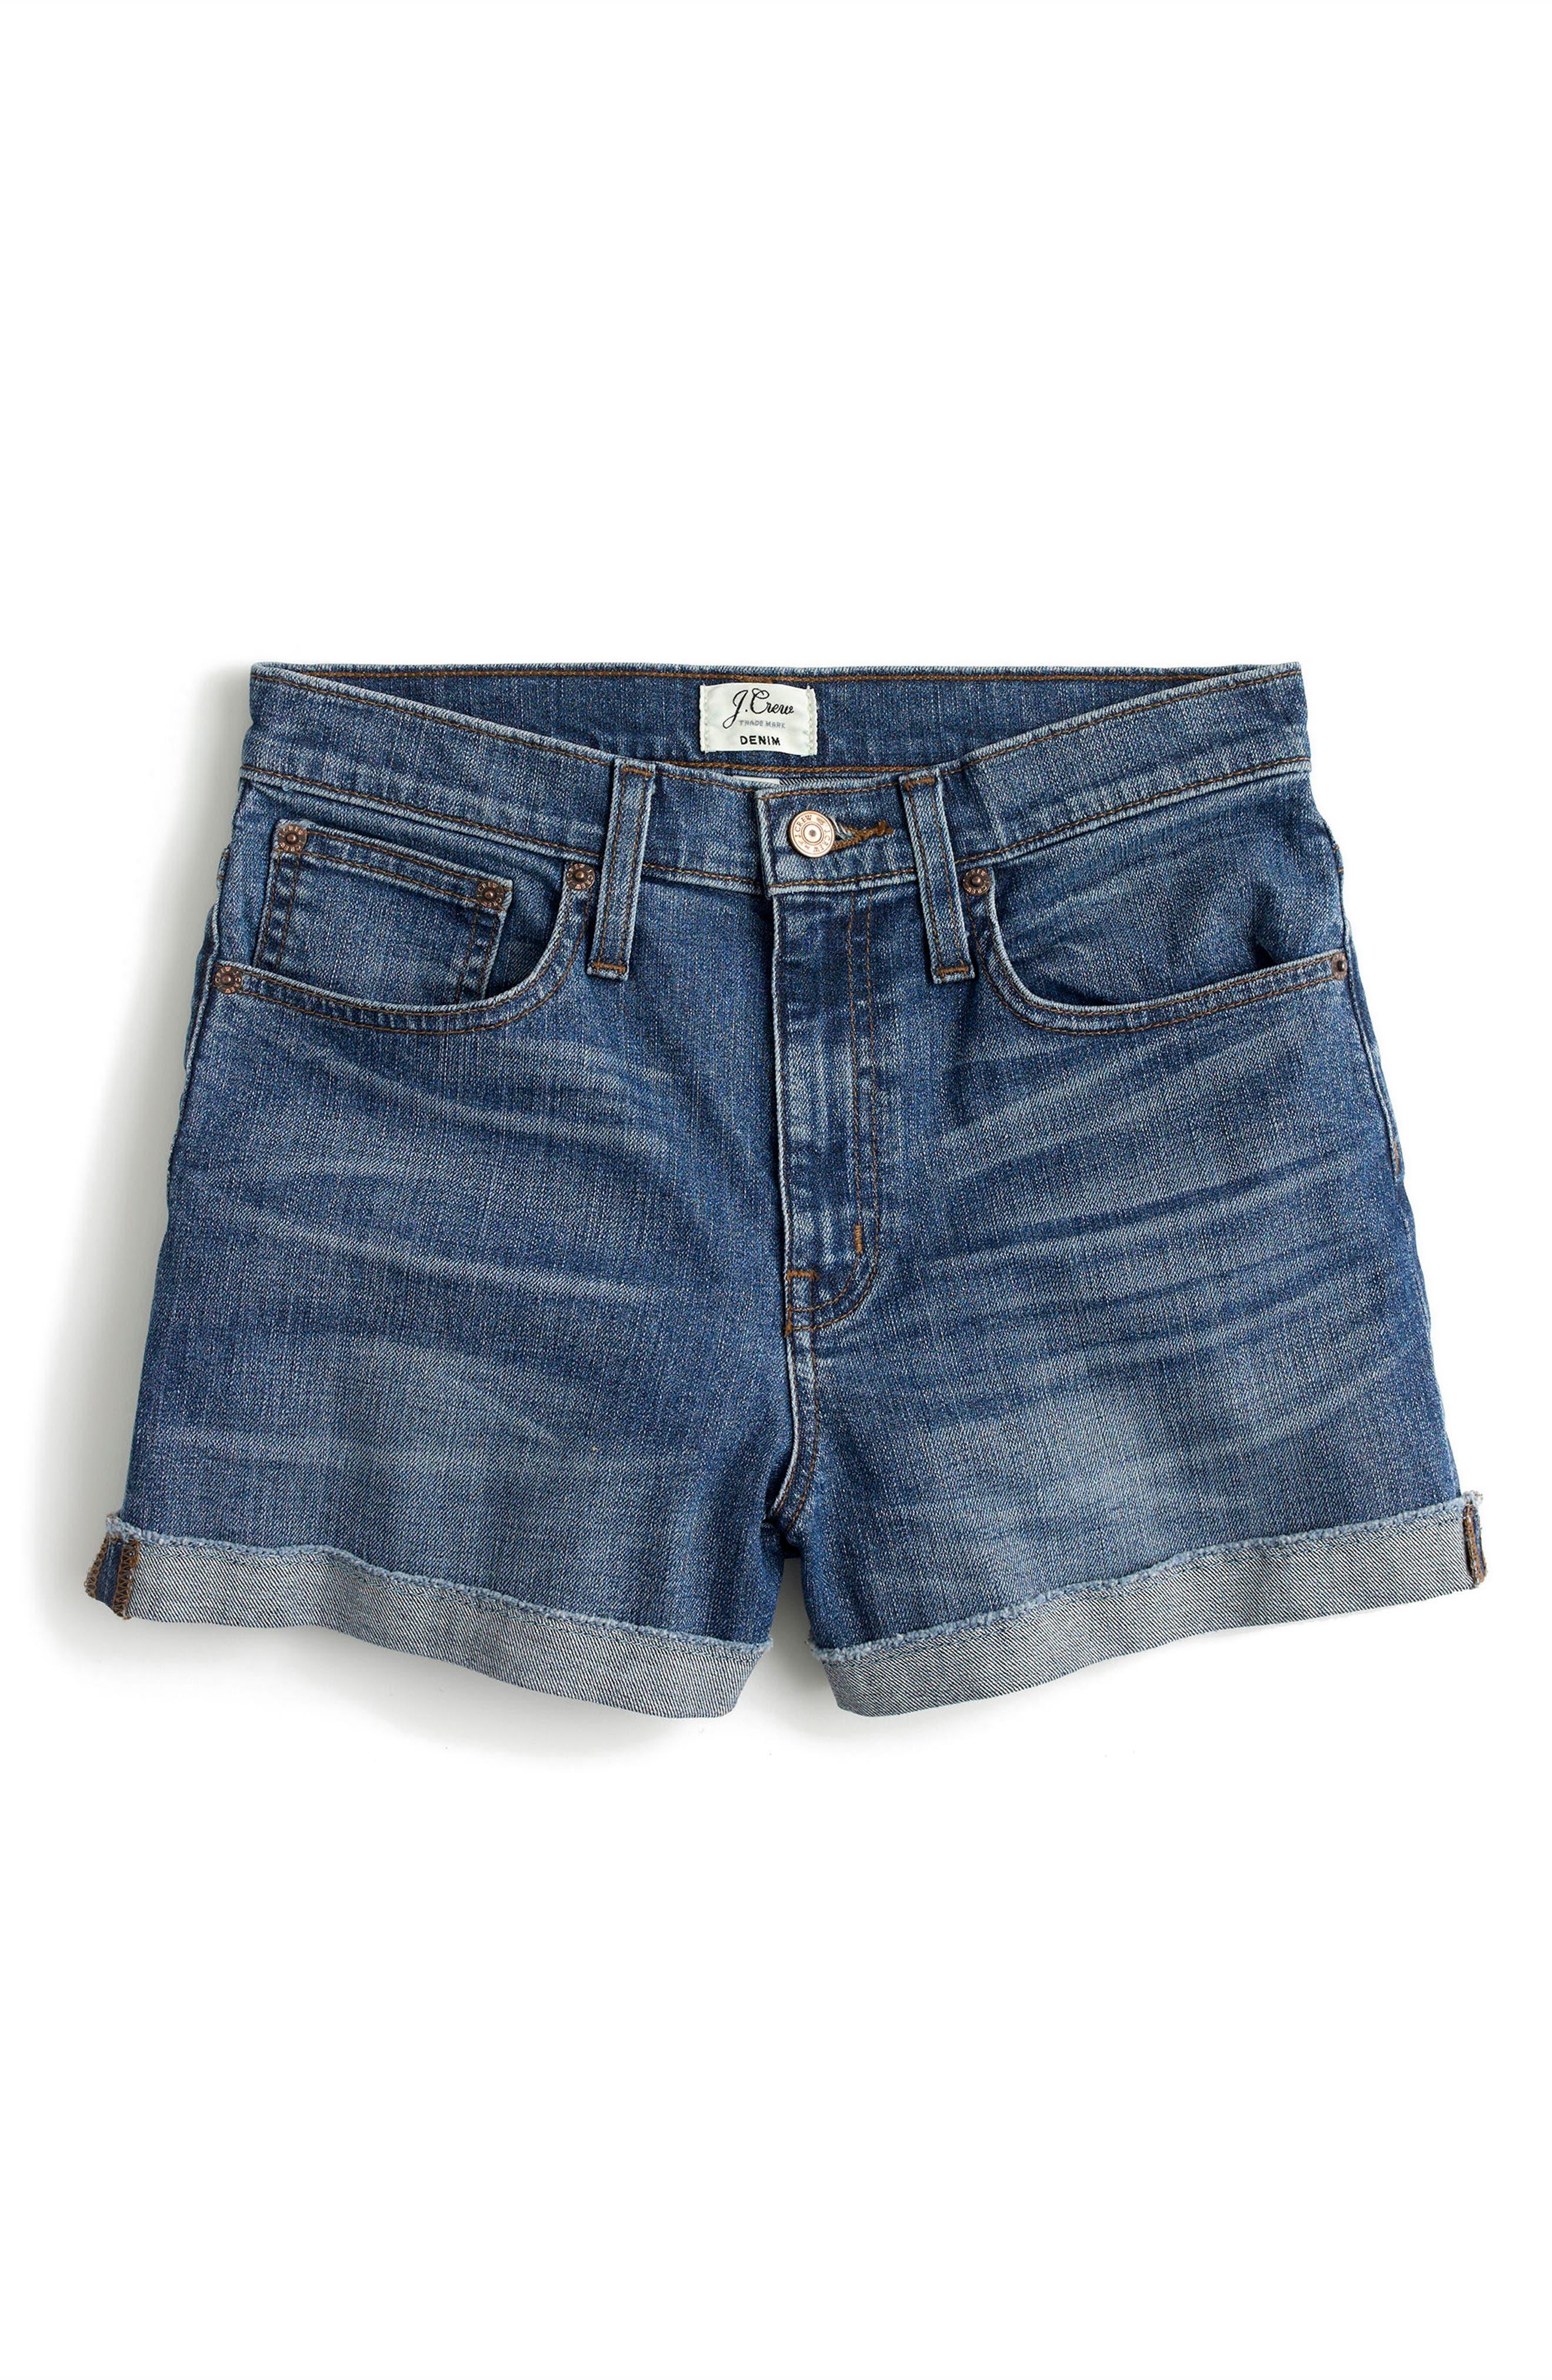 High Rise Denim Shorts,                             Alternate thumbnail 3, color,